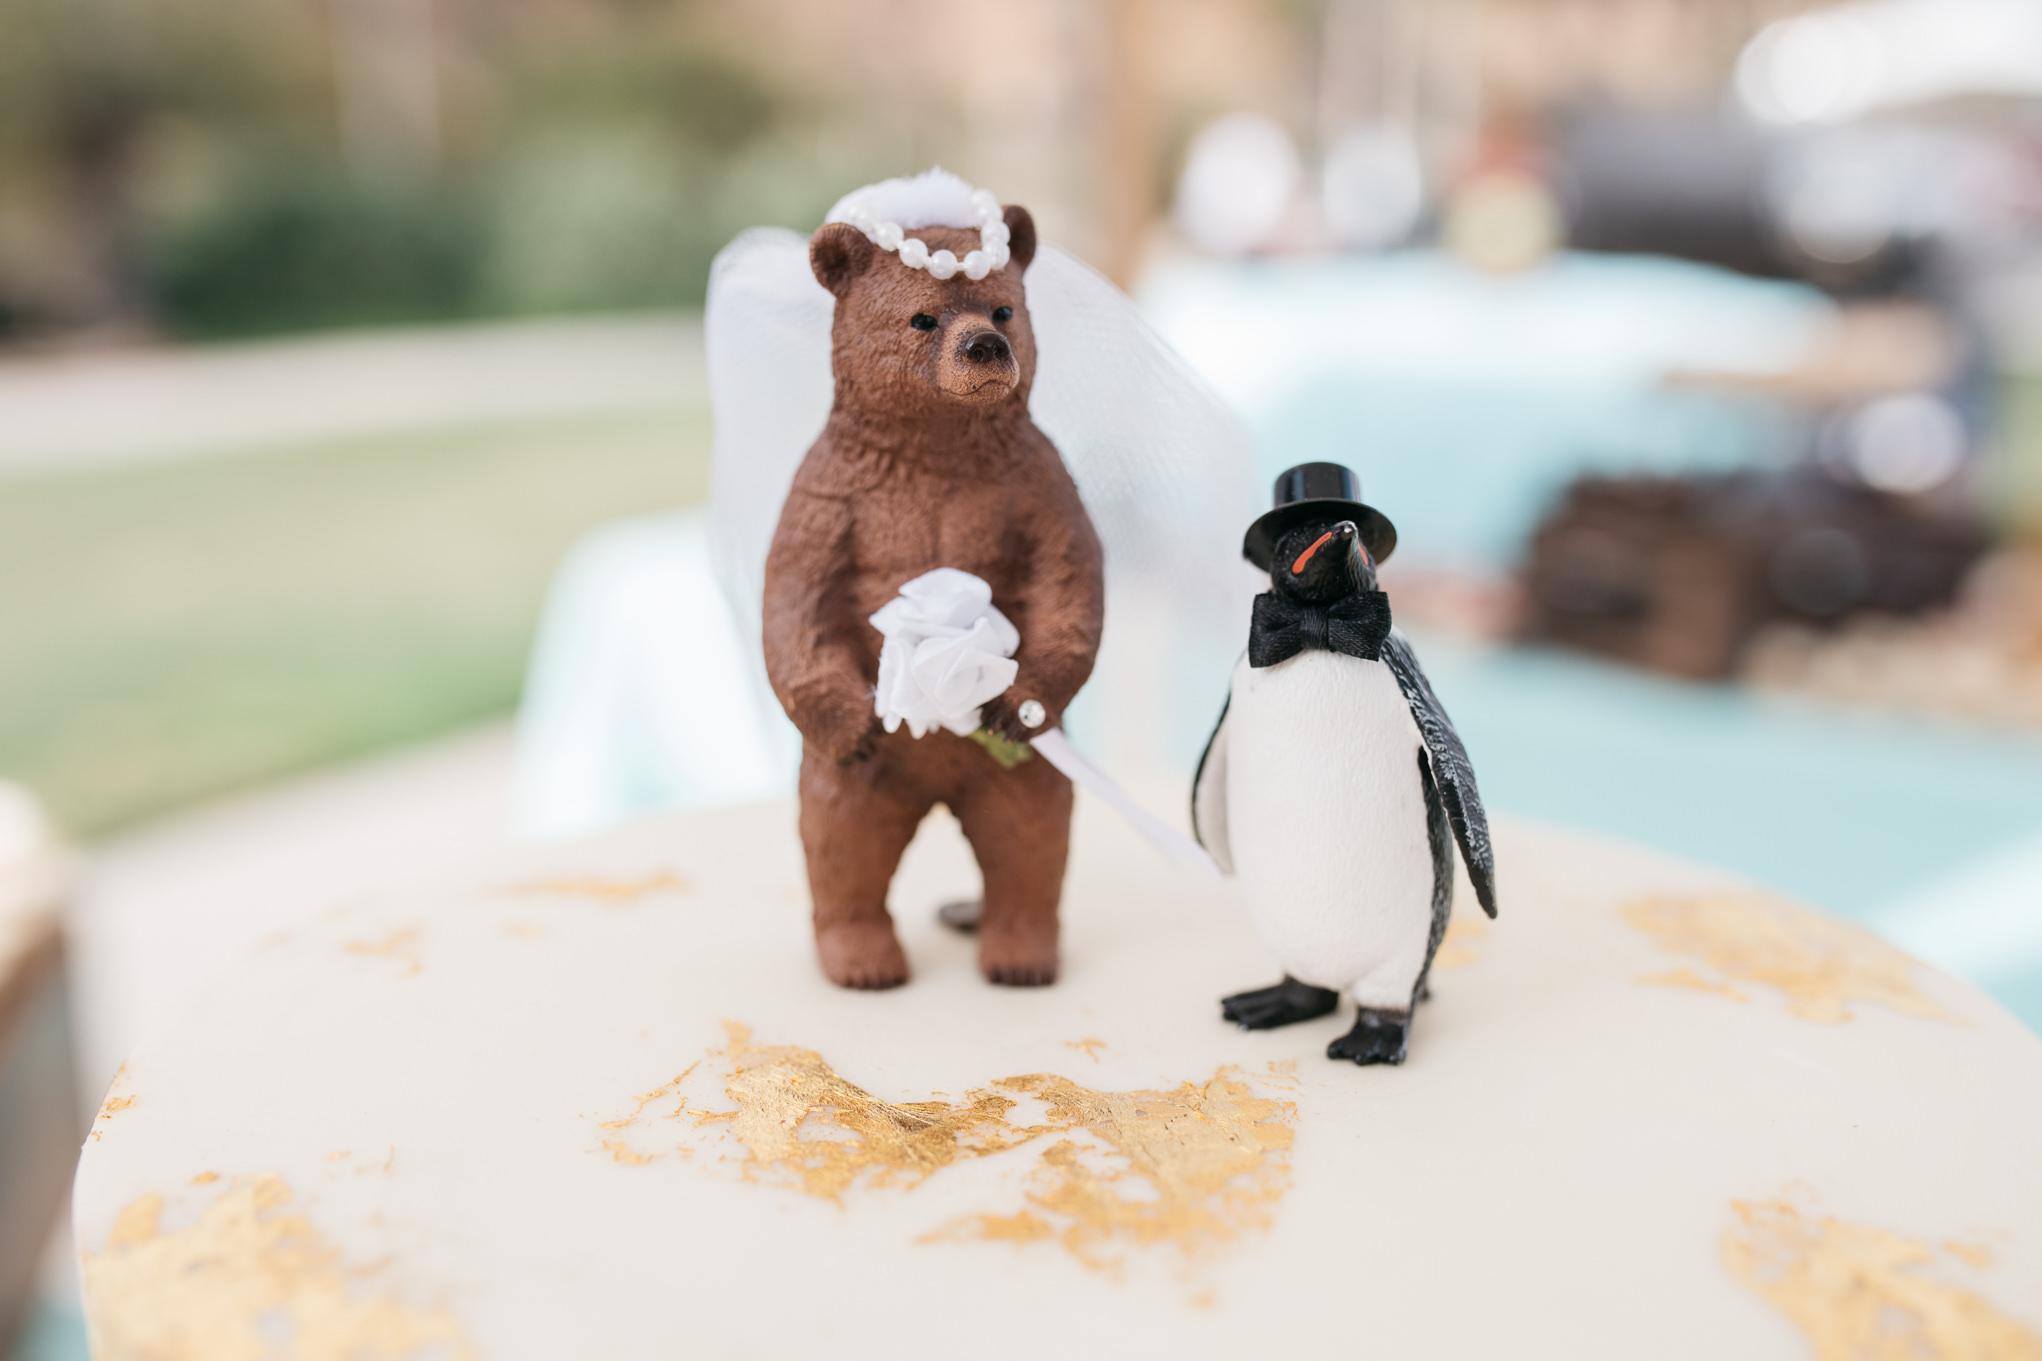 489_ONL_Jenny_Ken_Wedding_Trevor_Hooper_Photo.jpg